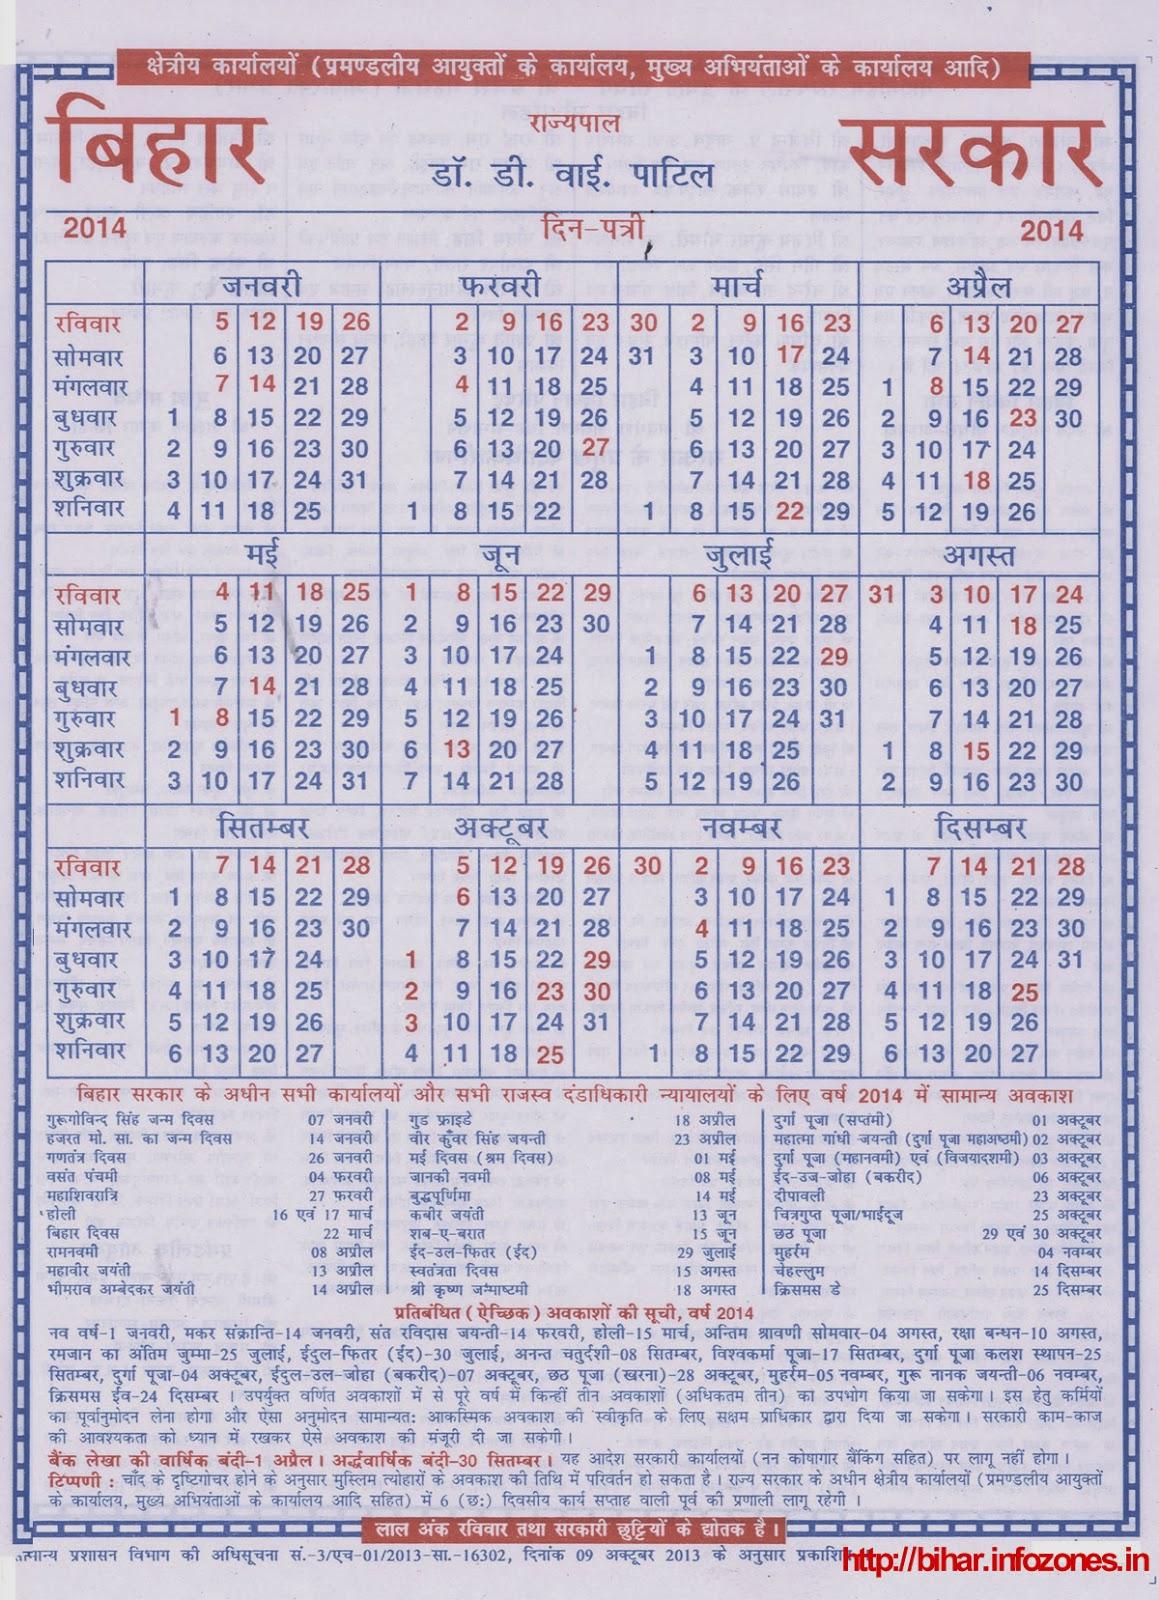 Bihar Government Calendar 2014 intended for Bihar Govt Calender